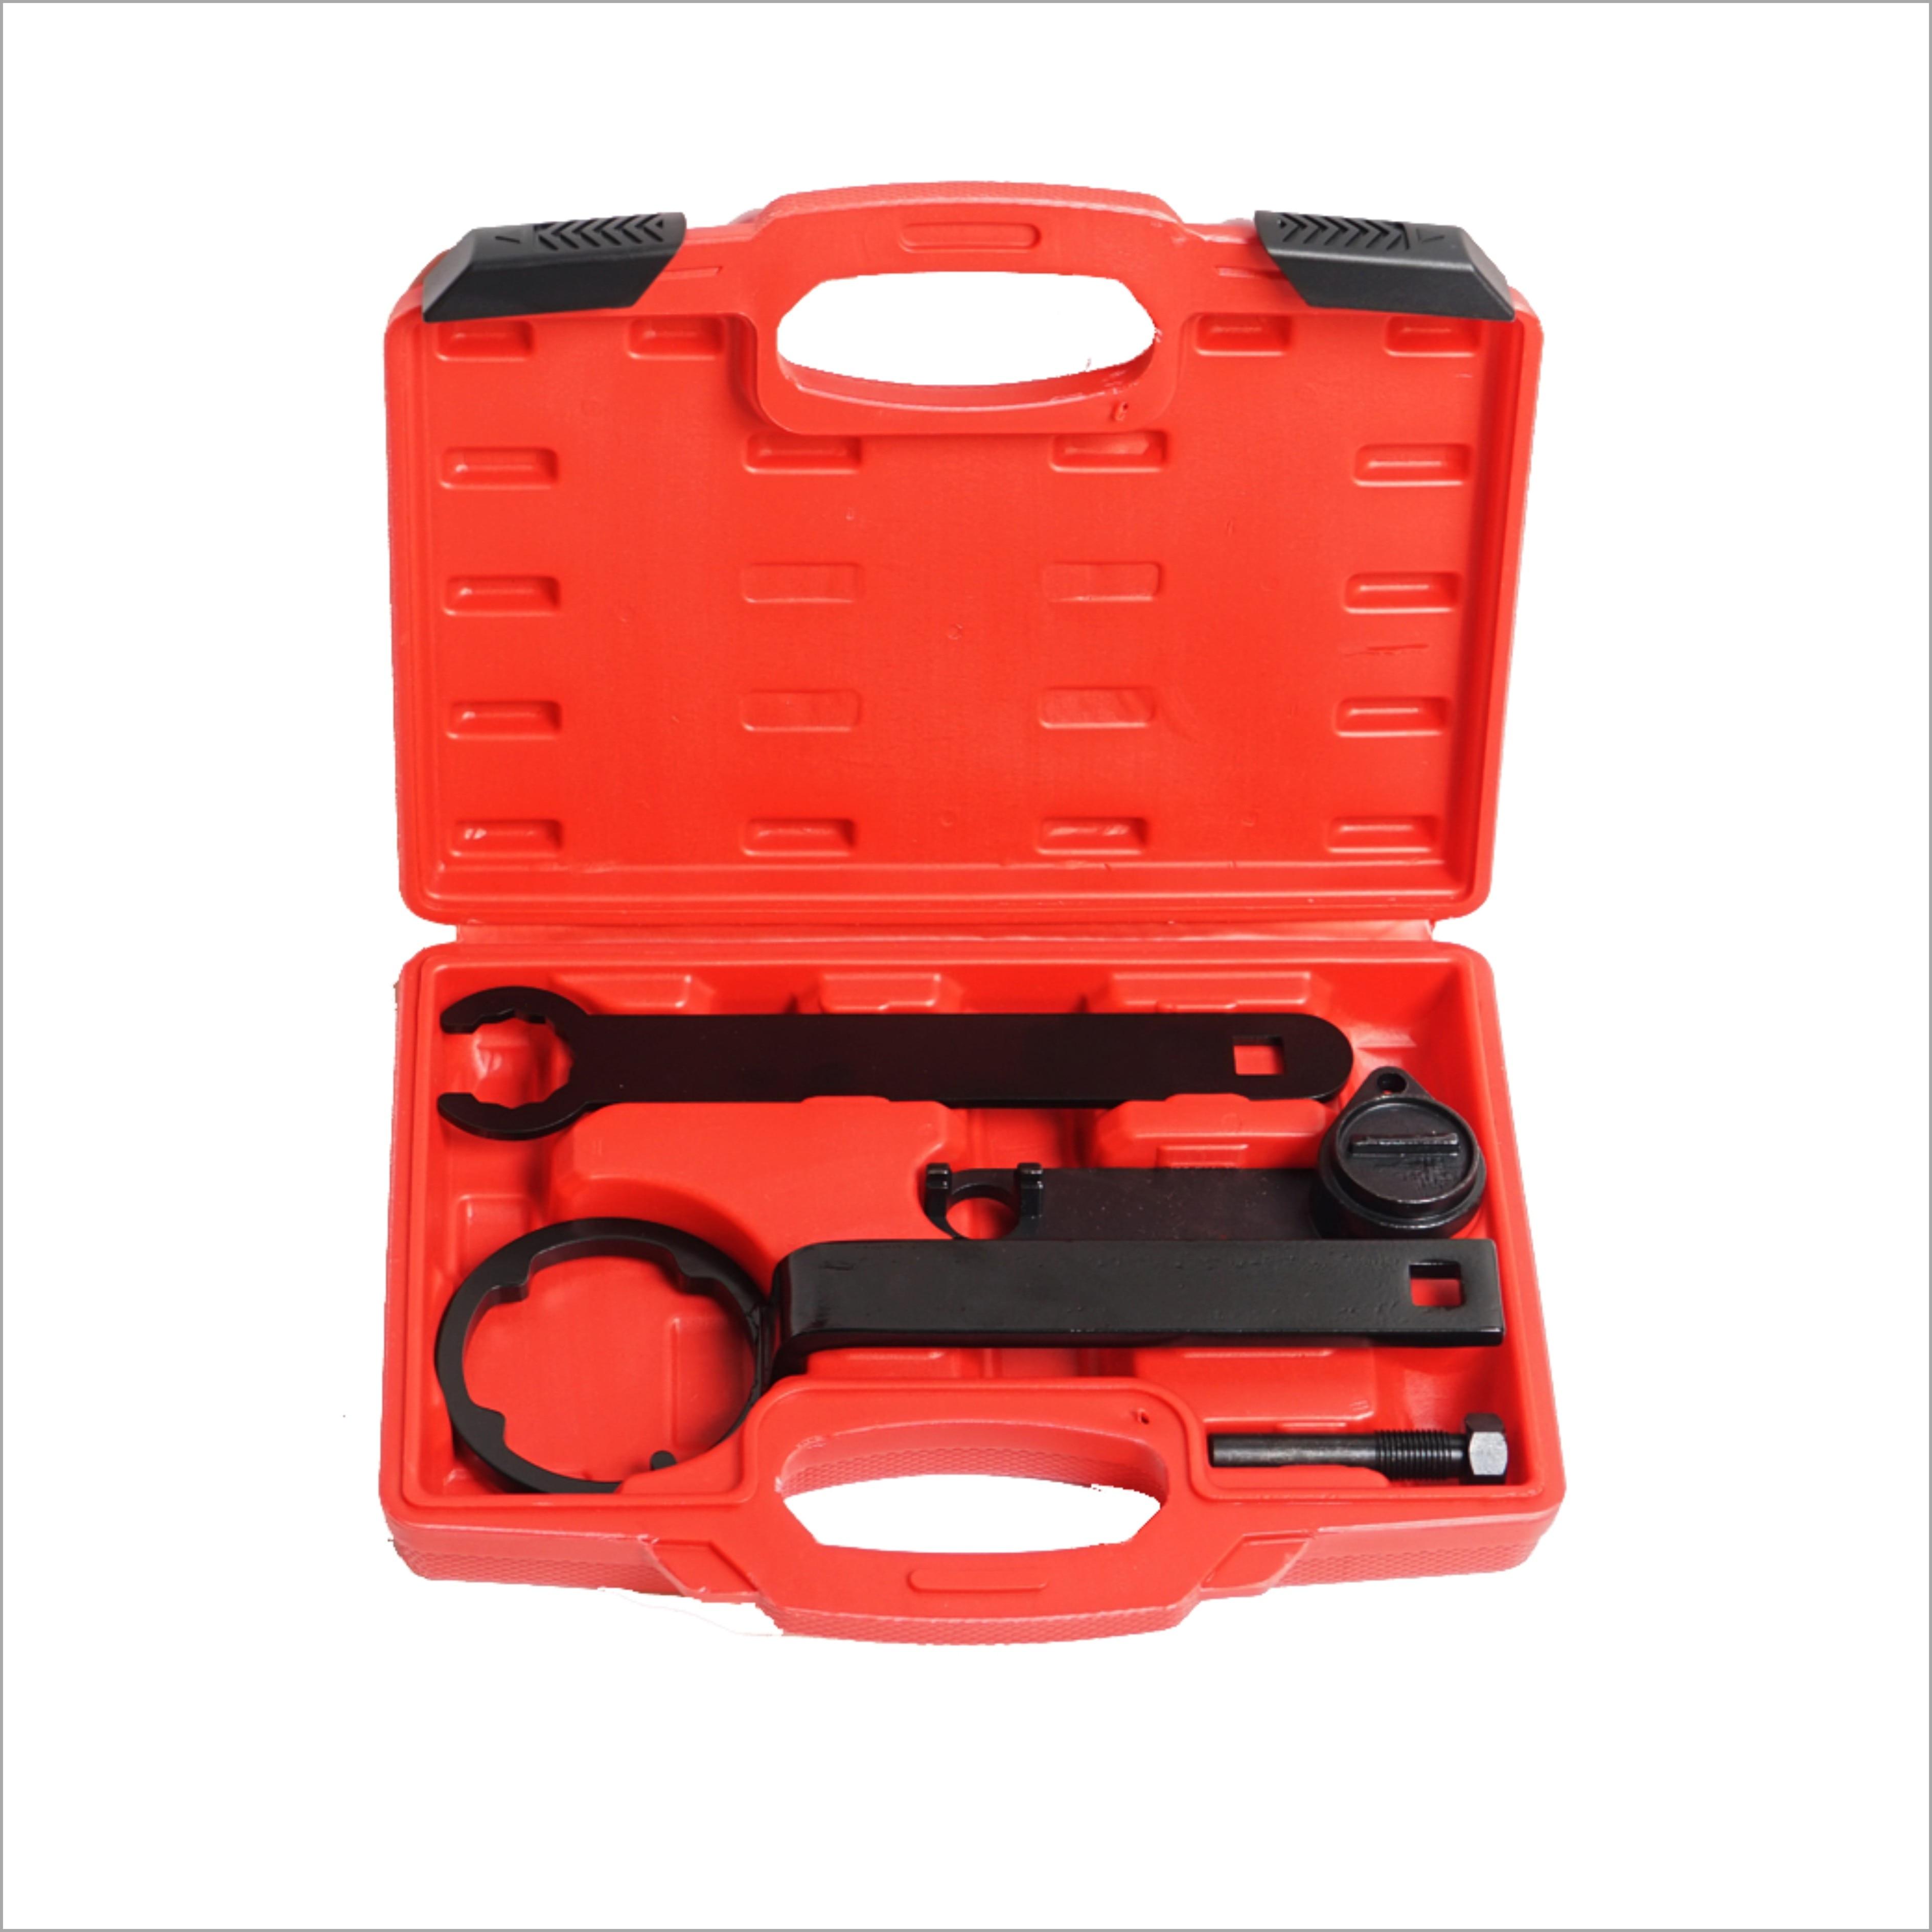 Engine Timing Tool Kit For Vw Skoda 14 16 Auto Repair 2003 Mitsubishi Diamante Fuse Puller Box Diagram